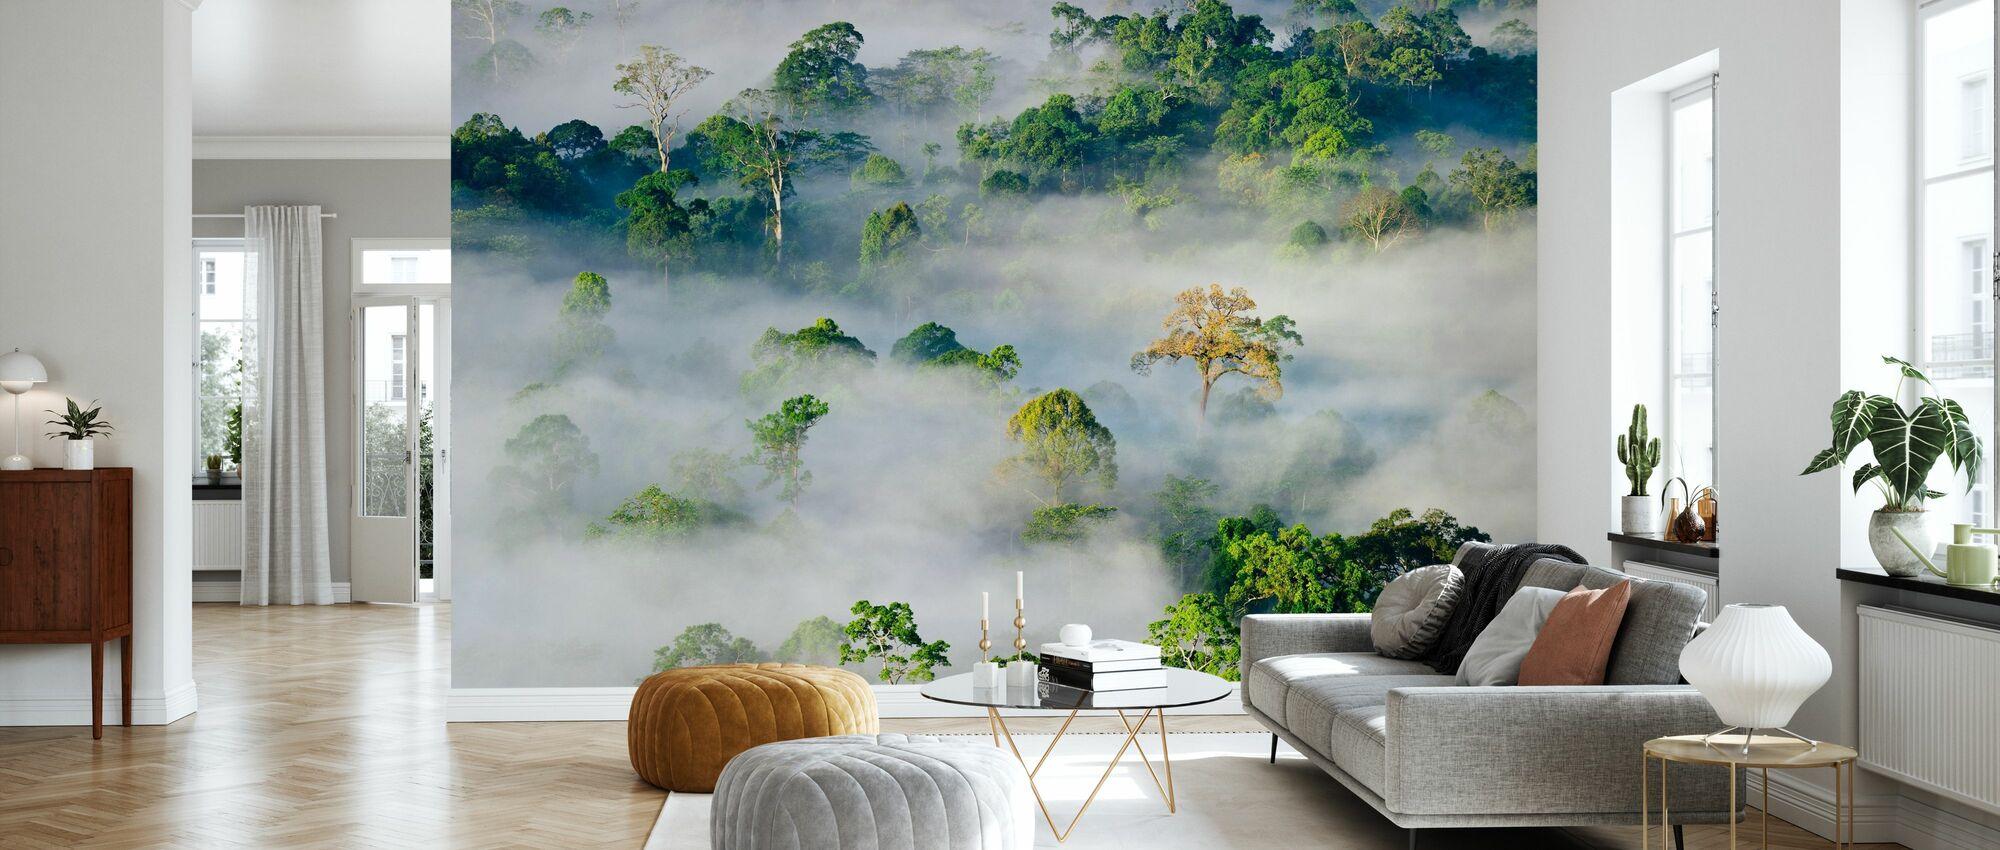 Lowland Dipterocarp Rainforest - Wallpaper - Living Room